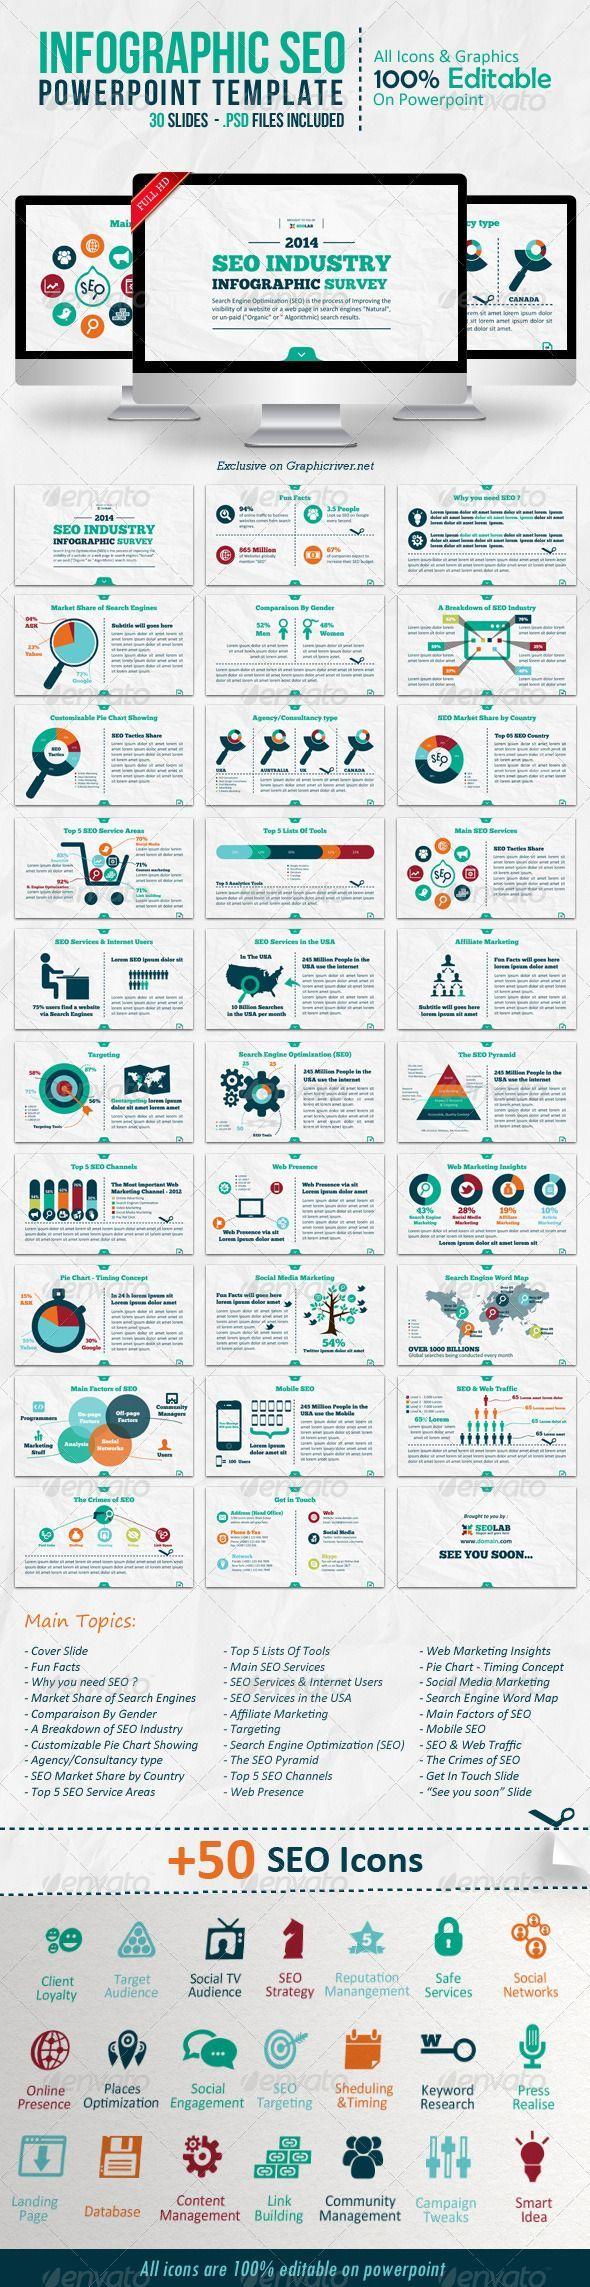 Presentation Templates - Infographic SEO Powerpoint Template   GraphicRiver #infographics